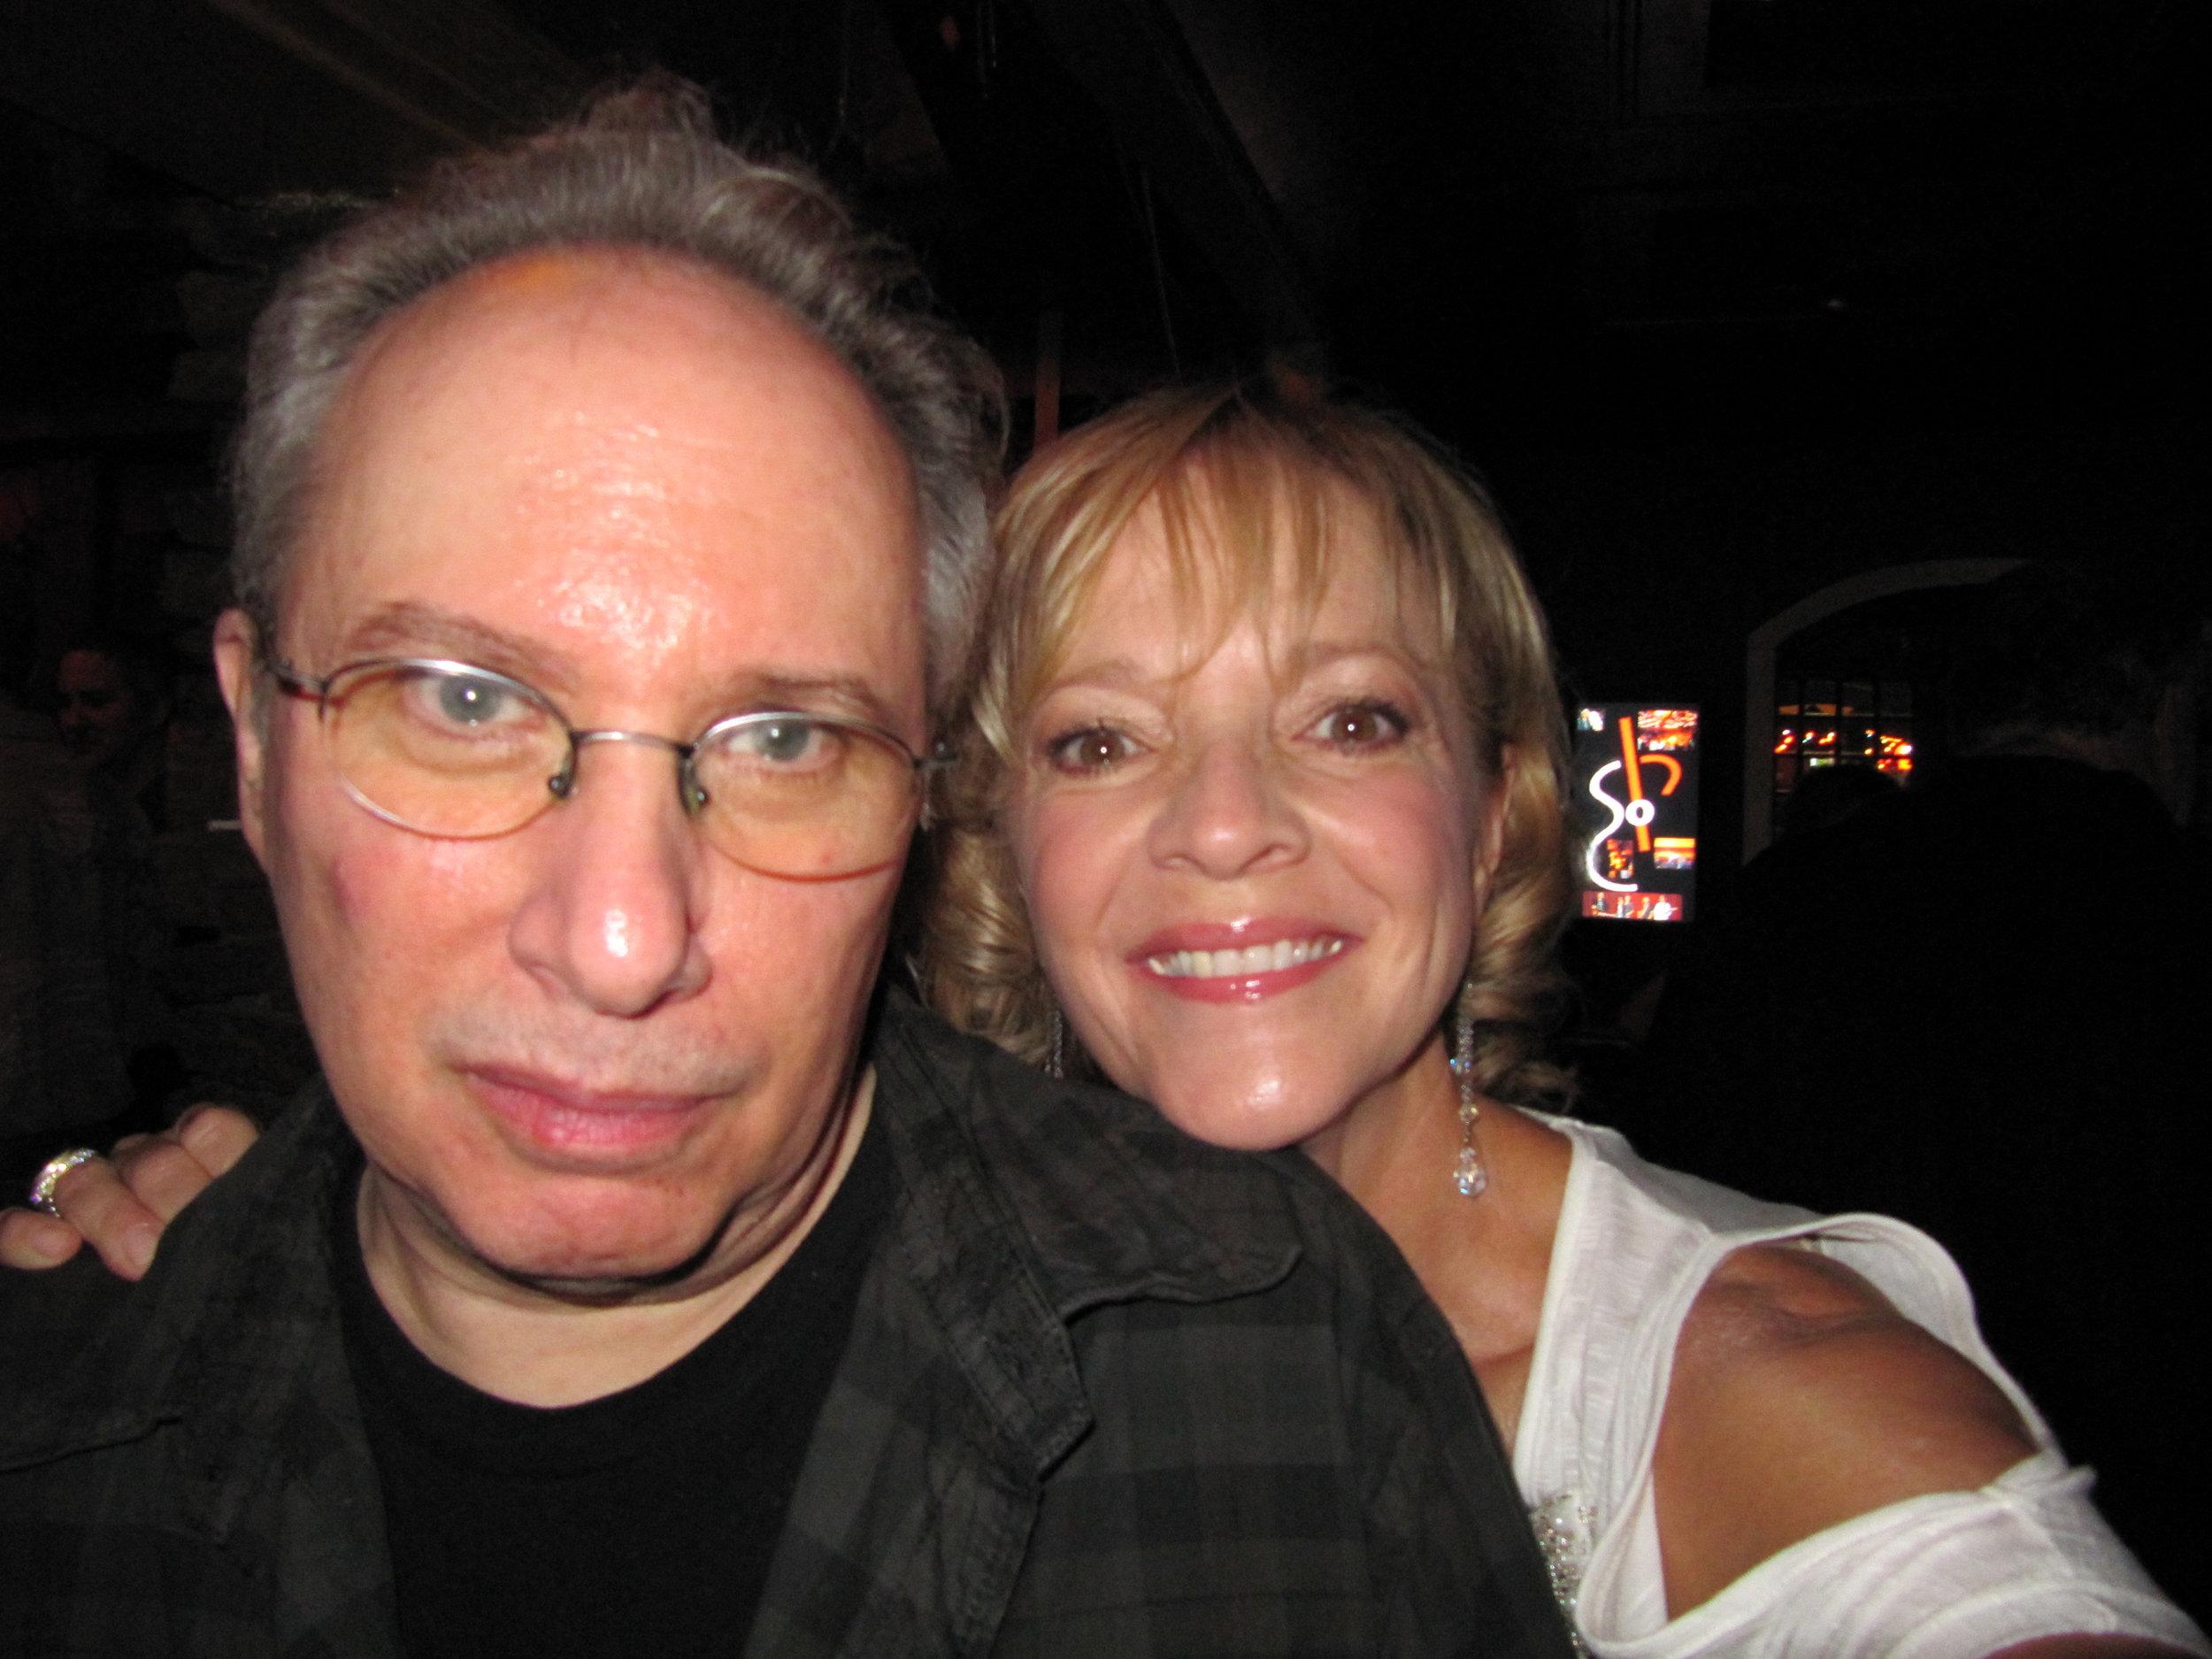 Arista NY A&R executive & friend Mitchell Cohen & Ramona @ Arista Nashville 20th Year Reunion.JPG